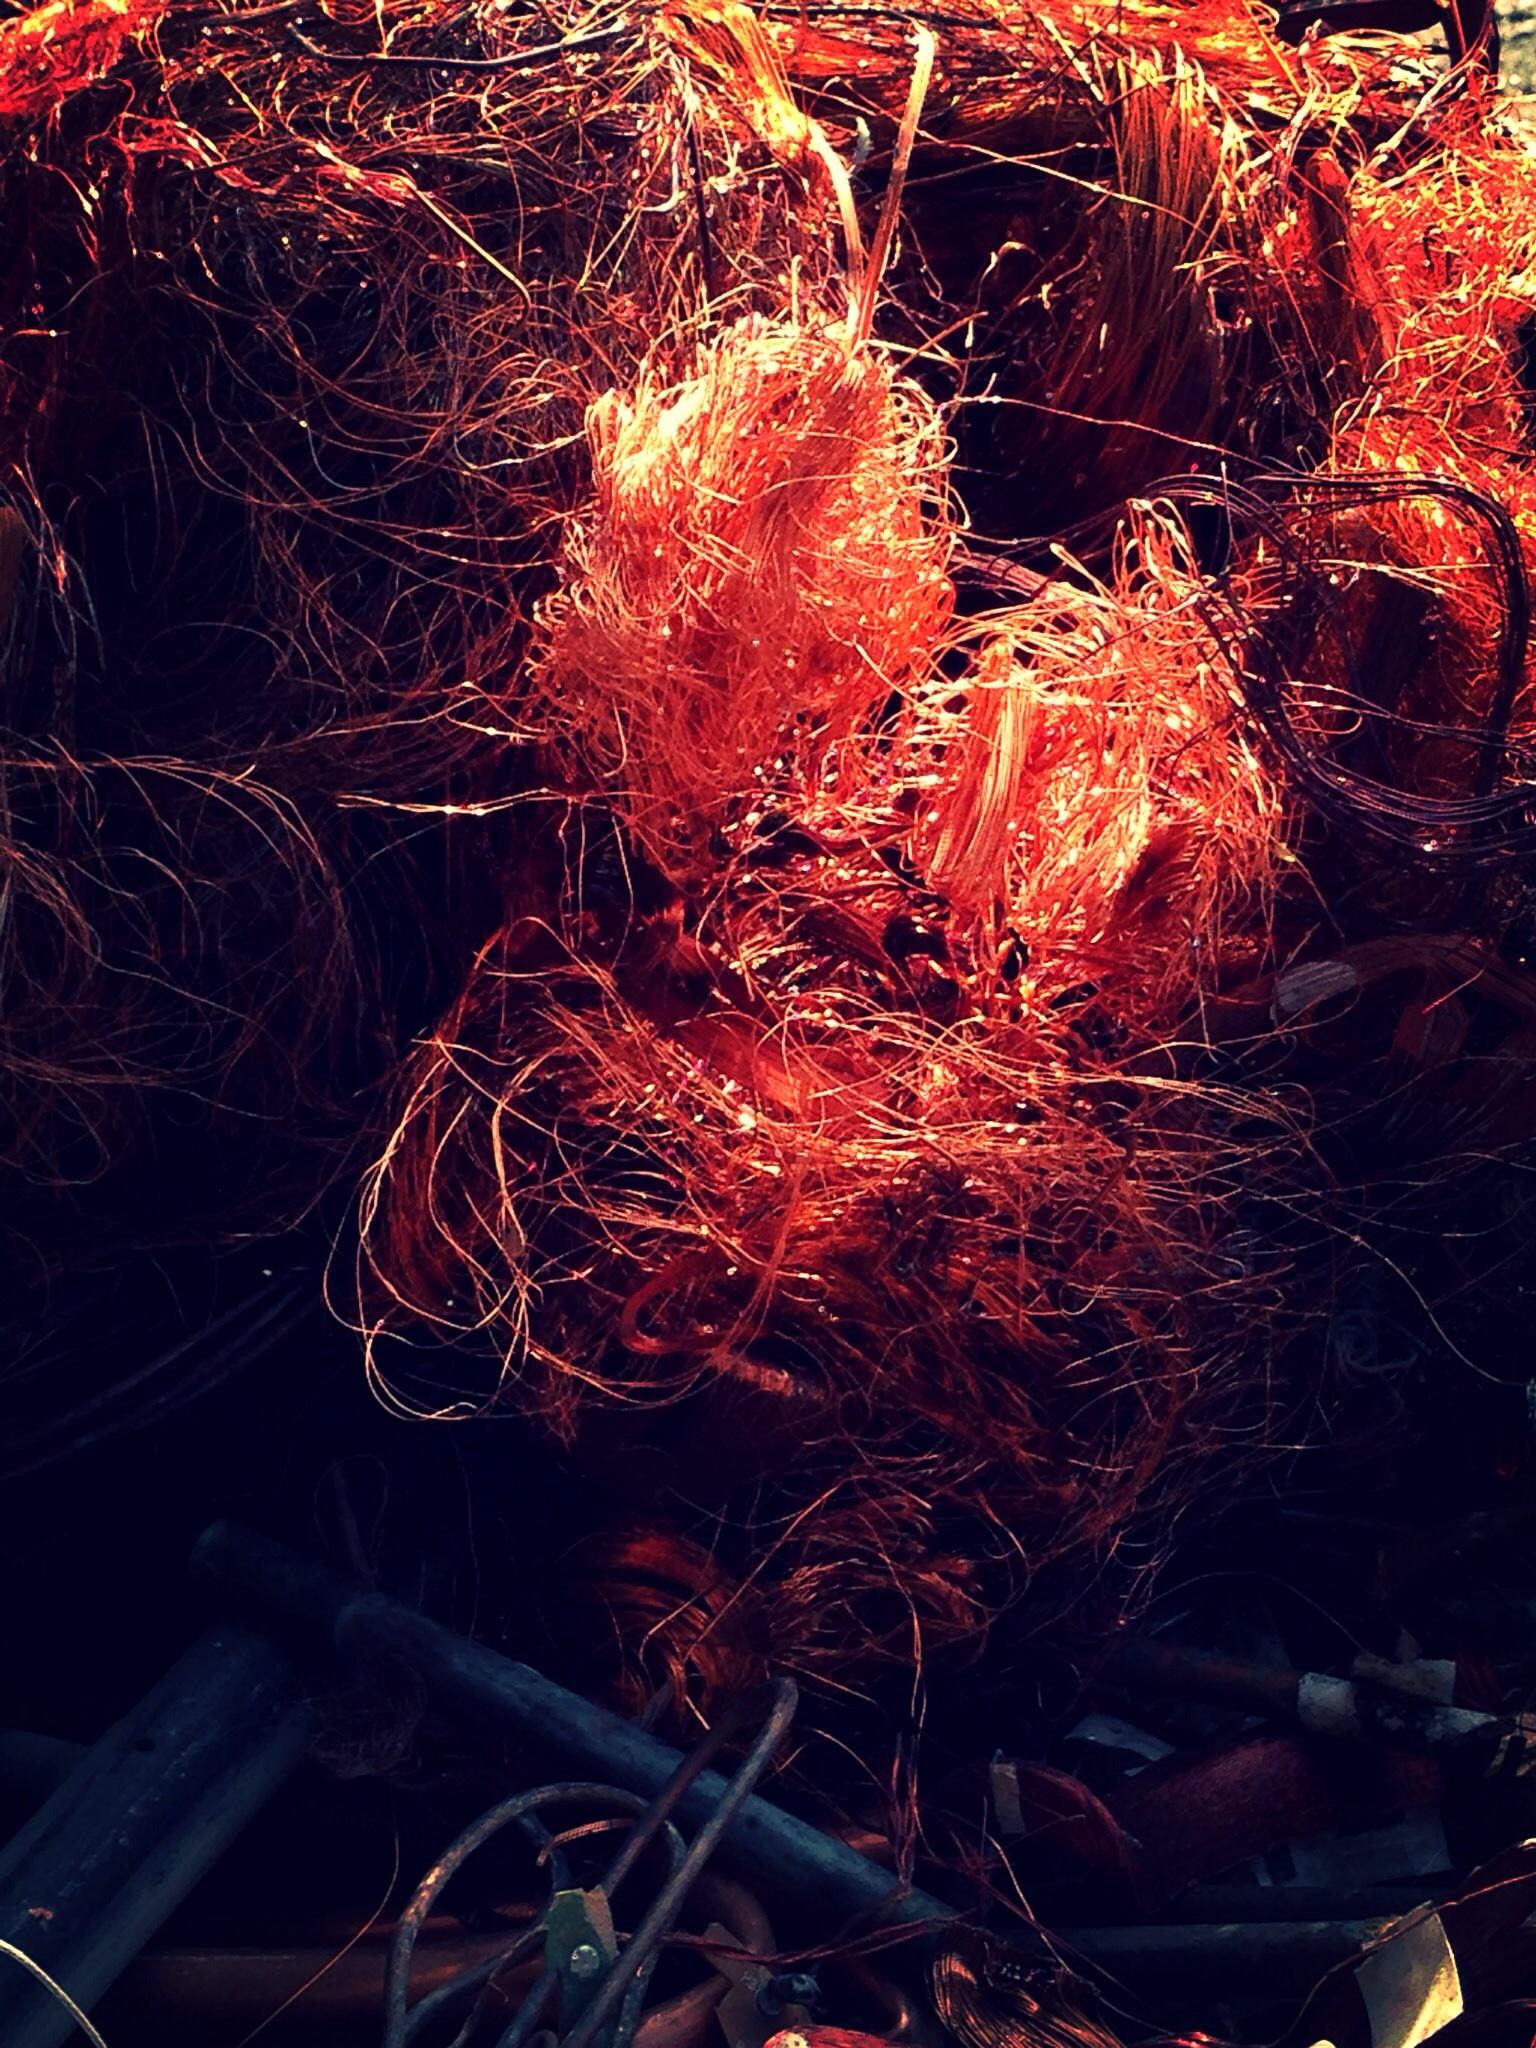 Artwork from the book - When Autumn comes   –   עם בוא הסתיו by Rachel Tucker Shynes - Illustrated by Rachel Tucker Shynes/רחל טוקר שיינס - Ourboox.com